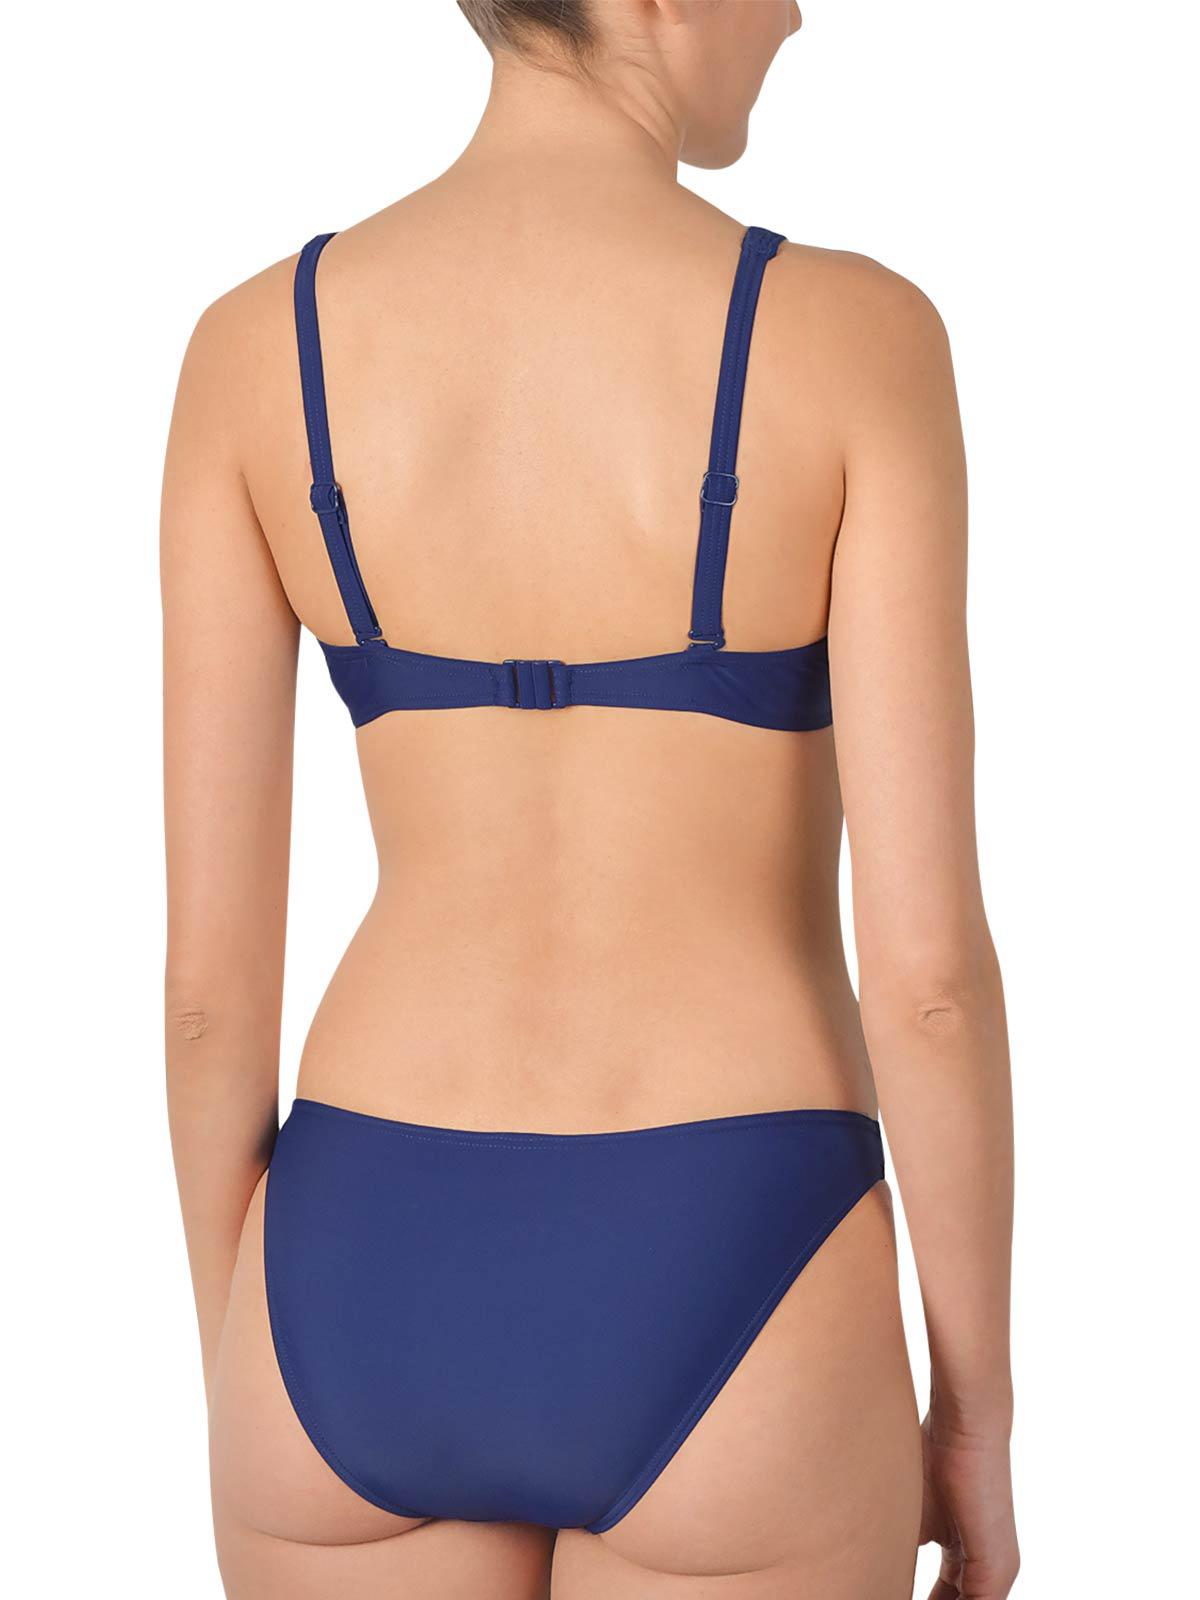 NATURANA Triangle Bügel Bikini 72522 Gr. 36-44 B-D